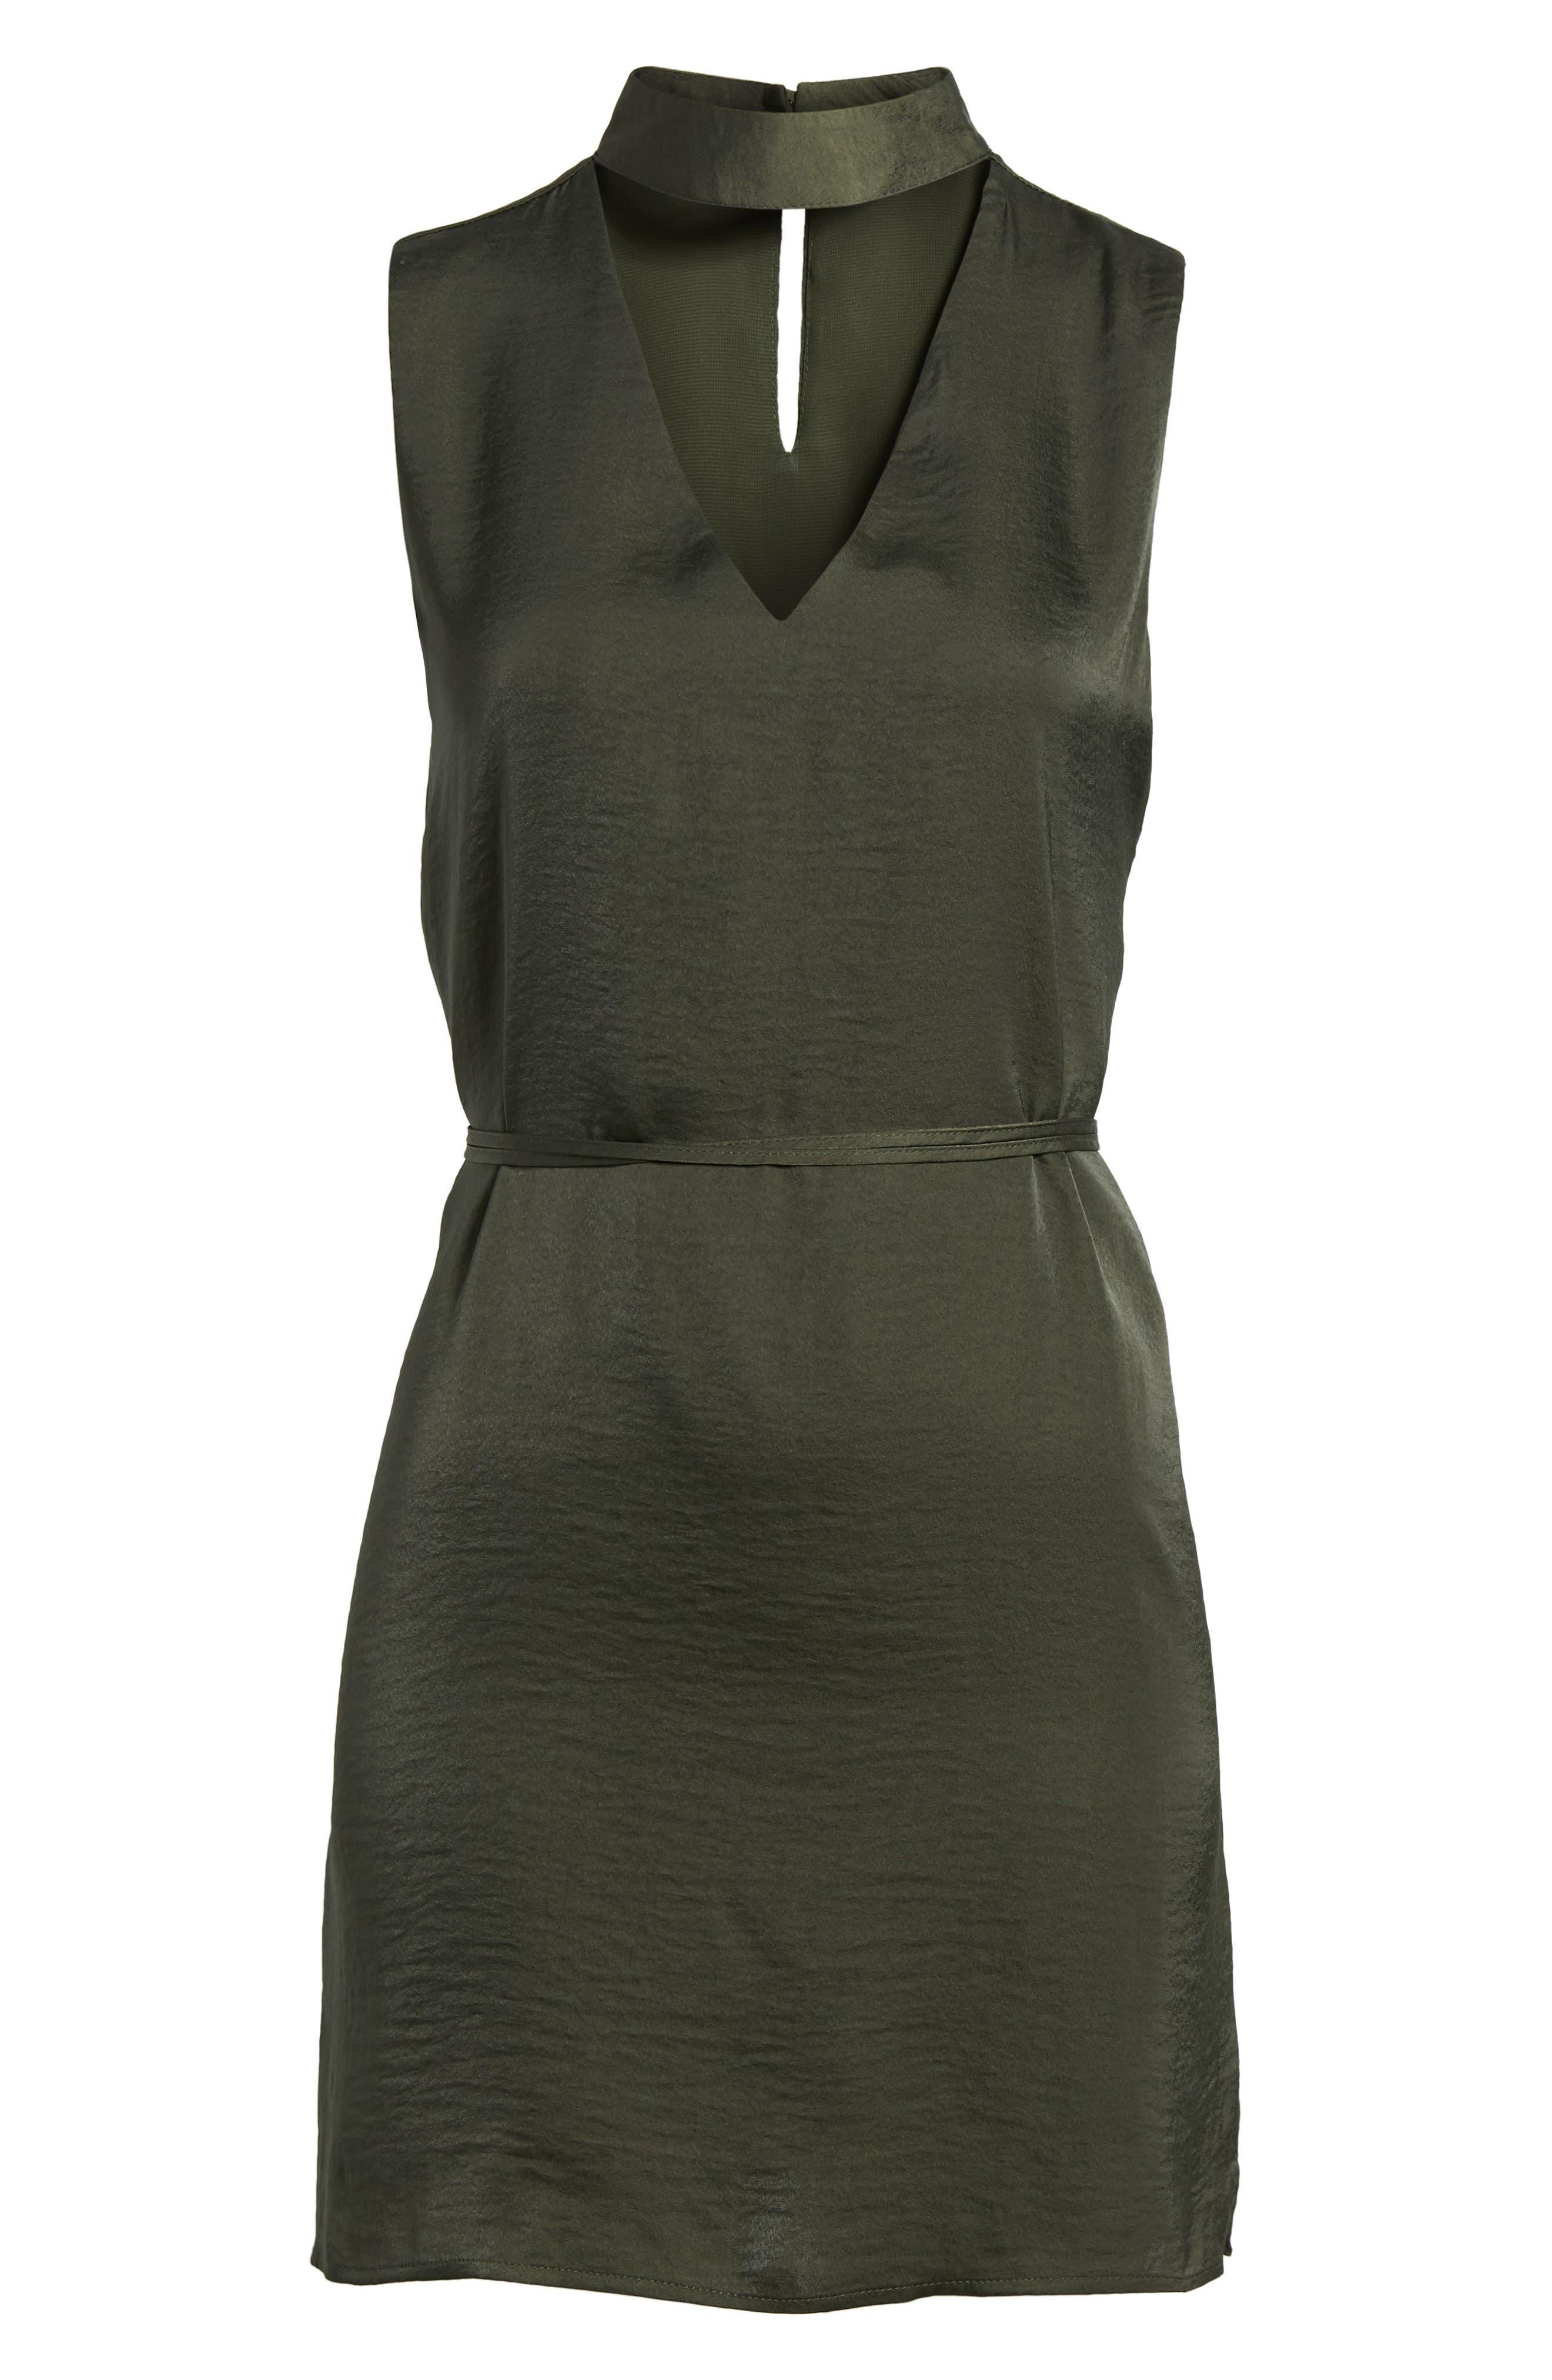 Hansel Sleeveless Dress,                             Alternate thumbnail 7, color,                             Army